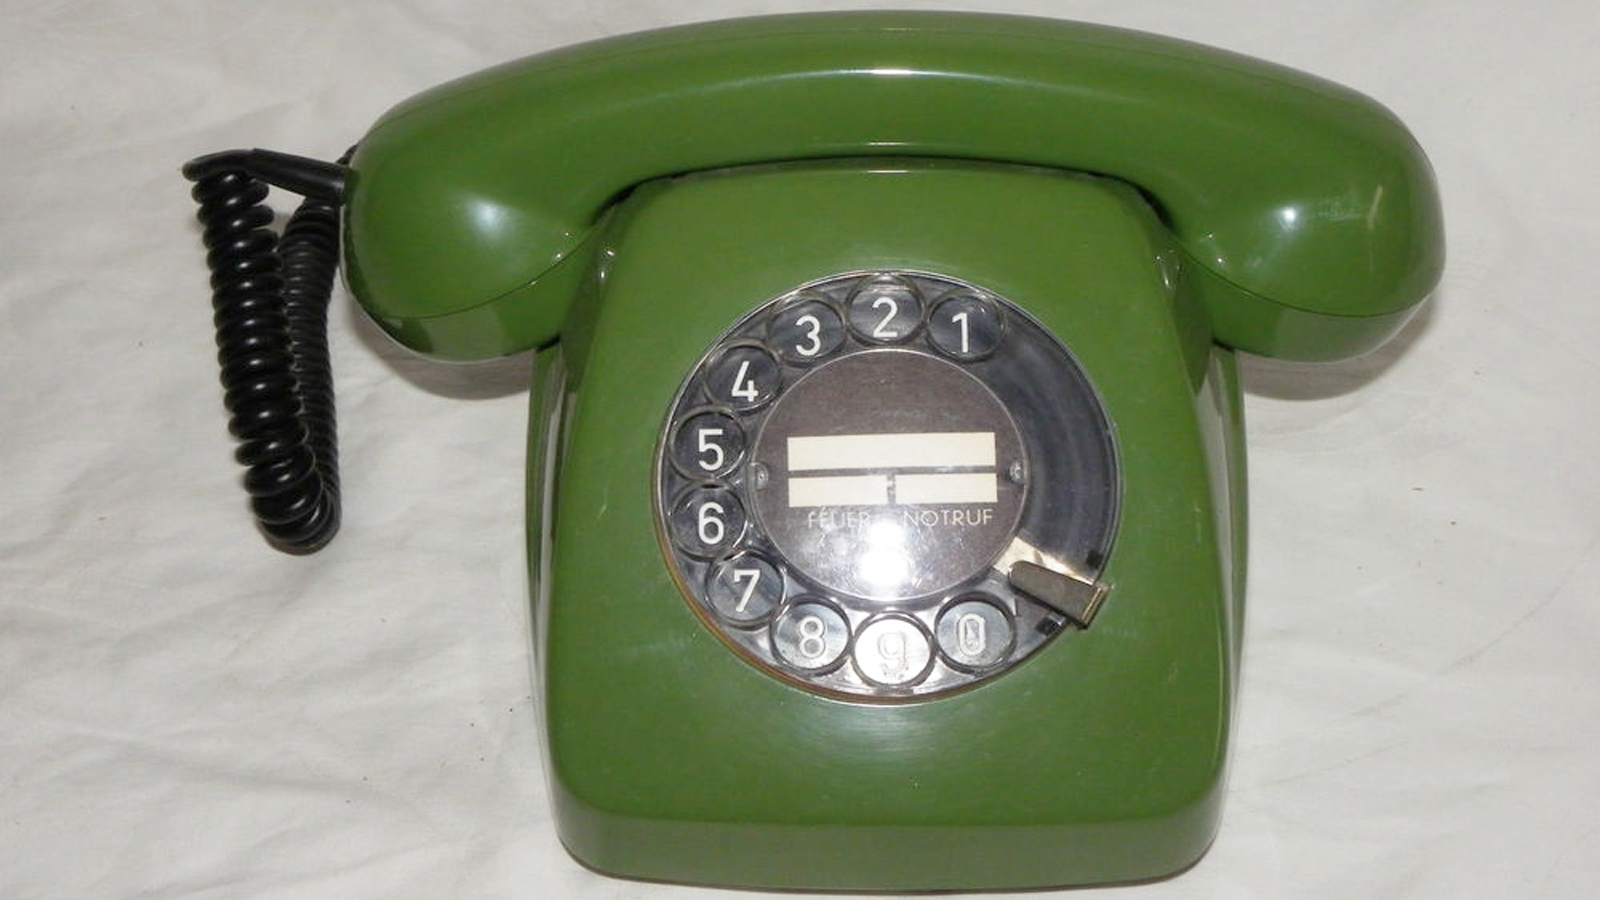 Swisscom zieht analogen Telefonen den Stecker